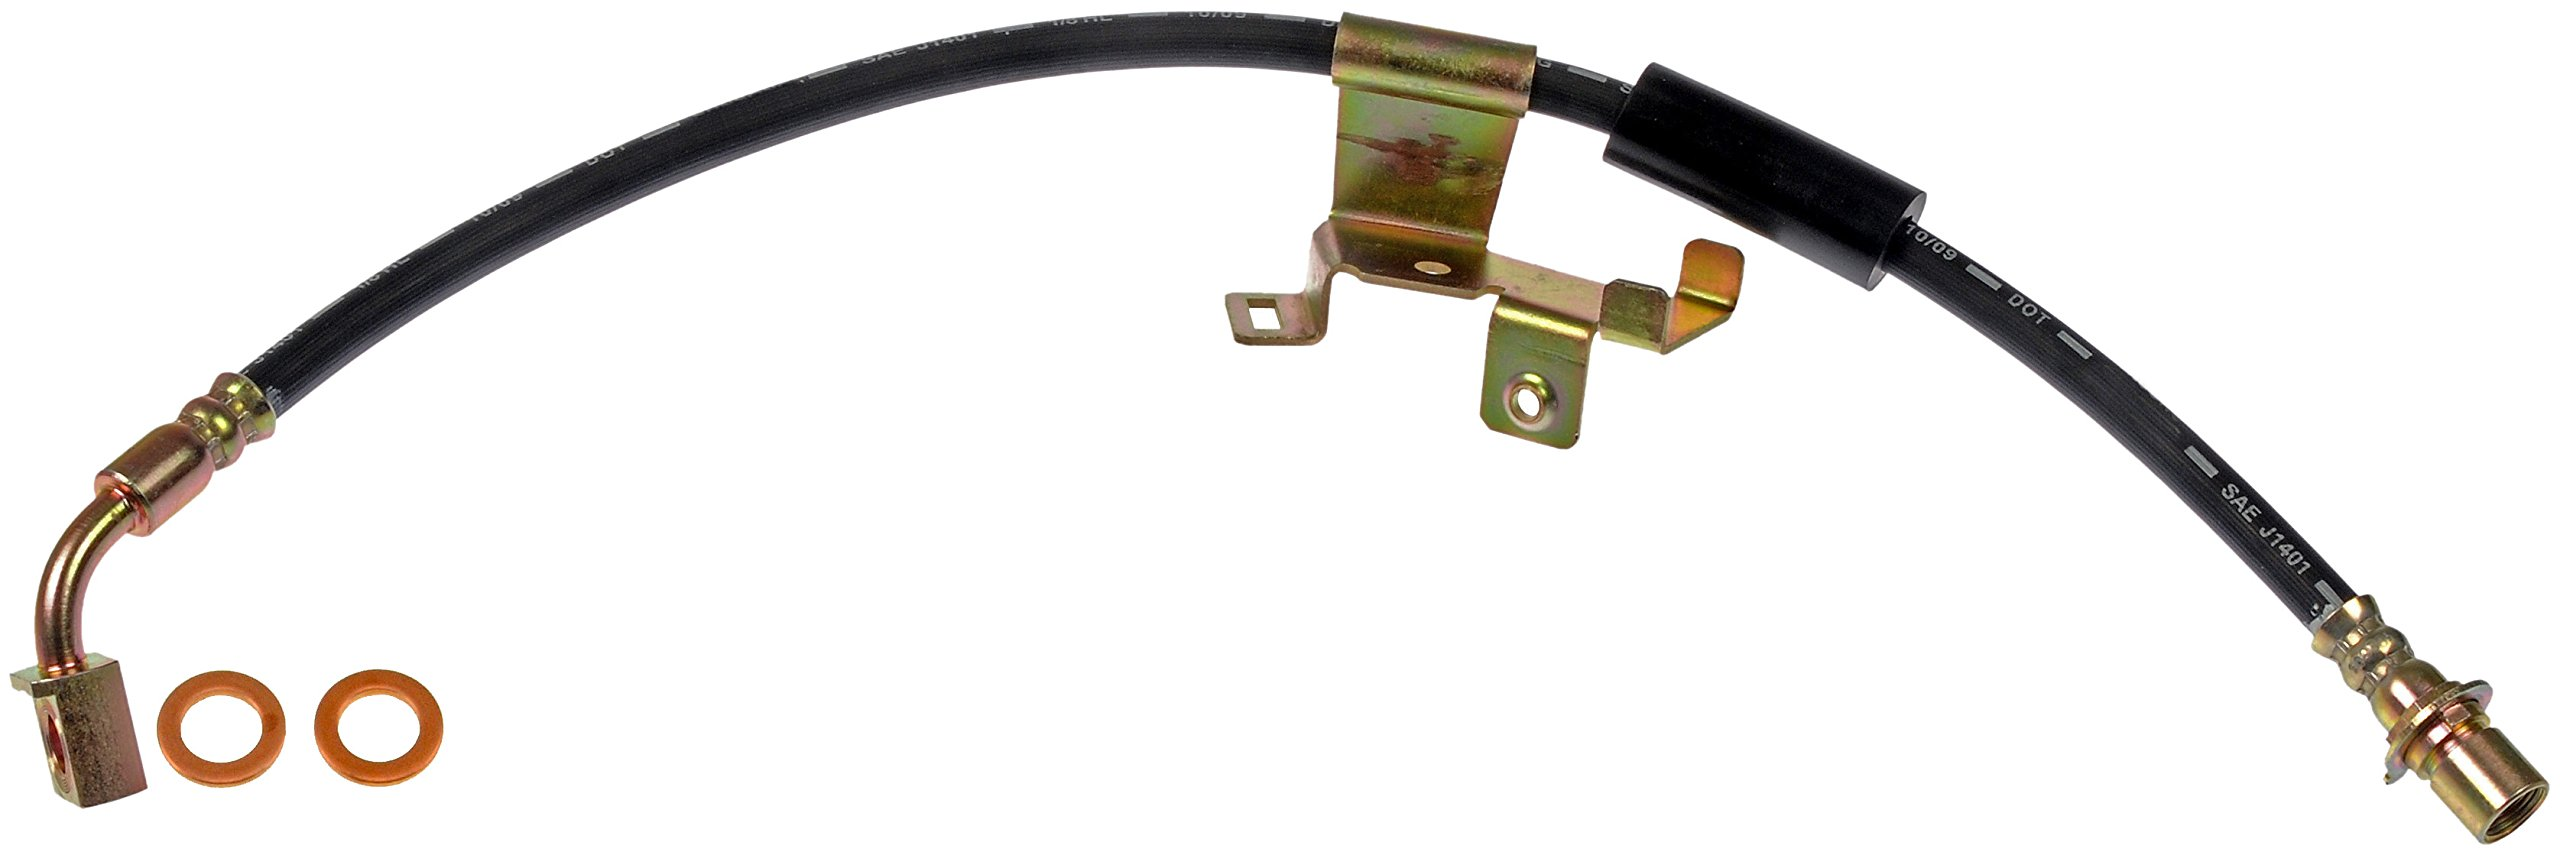 Dorman H620779 Hydraulic Brake Hose